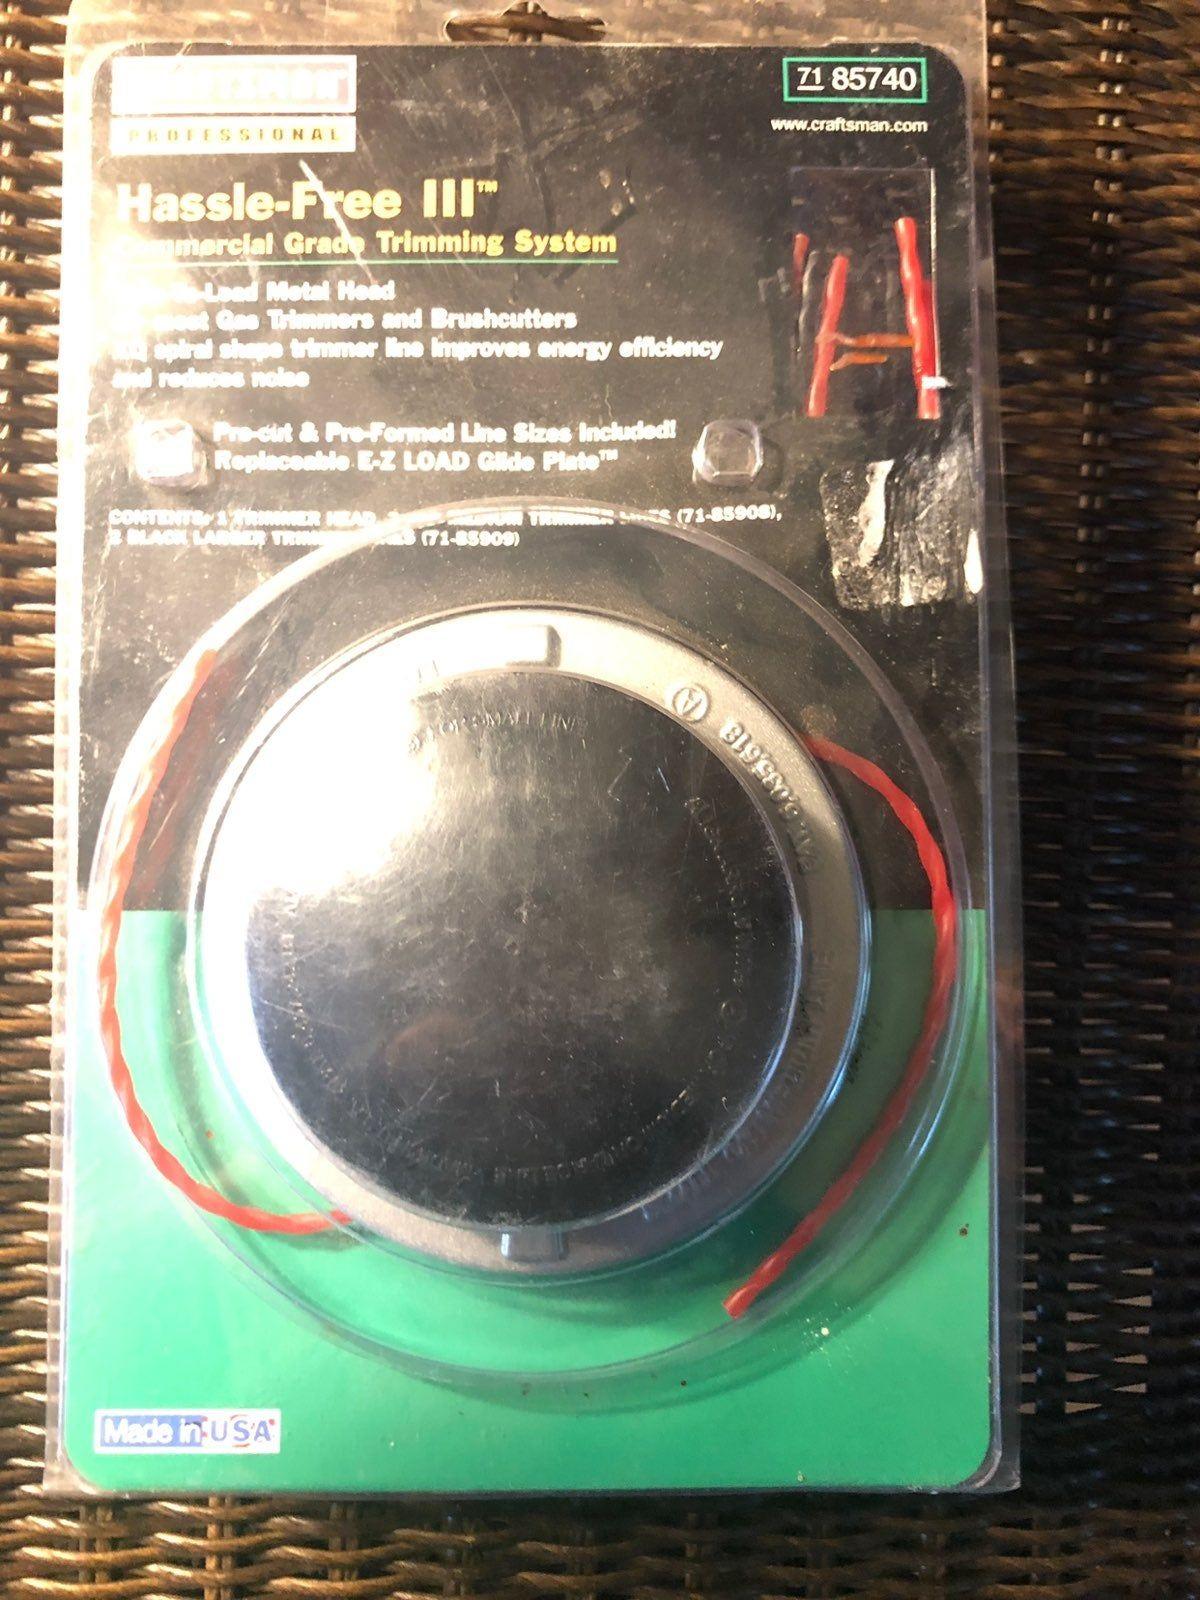 Pin On Craftsman Tools Equipment